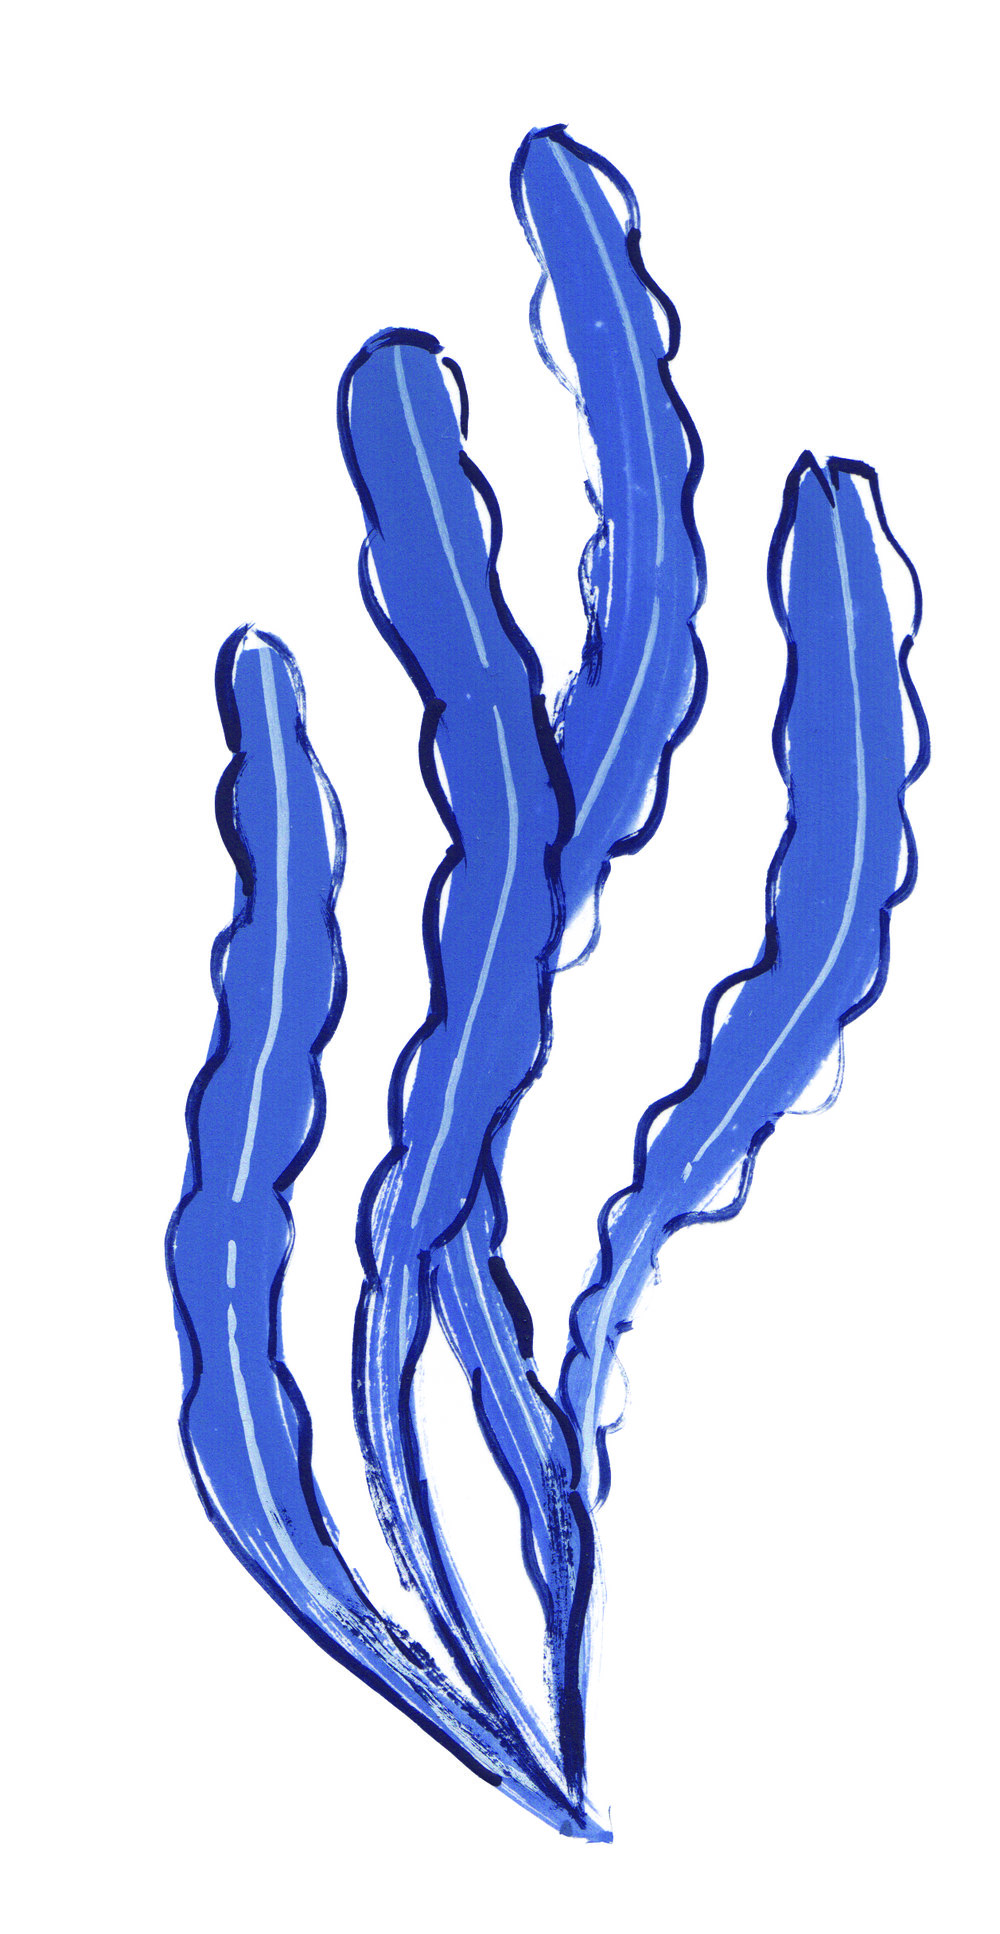 LongBlue.jpg